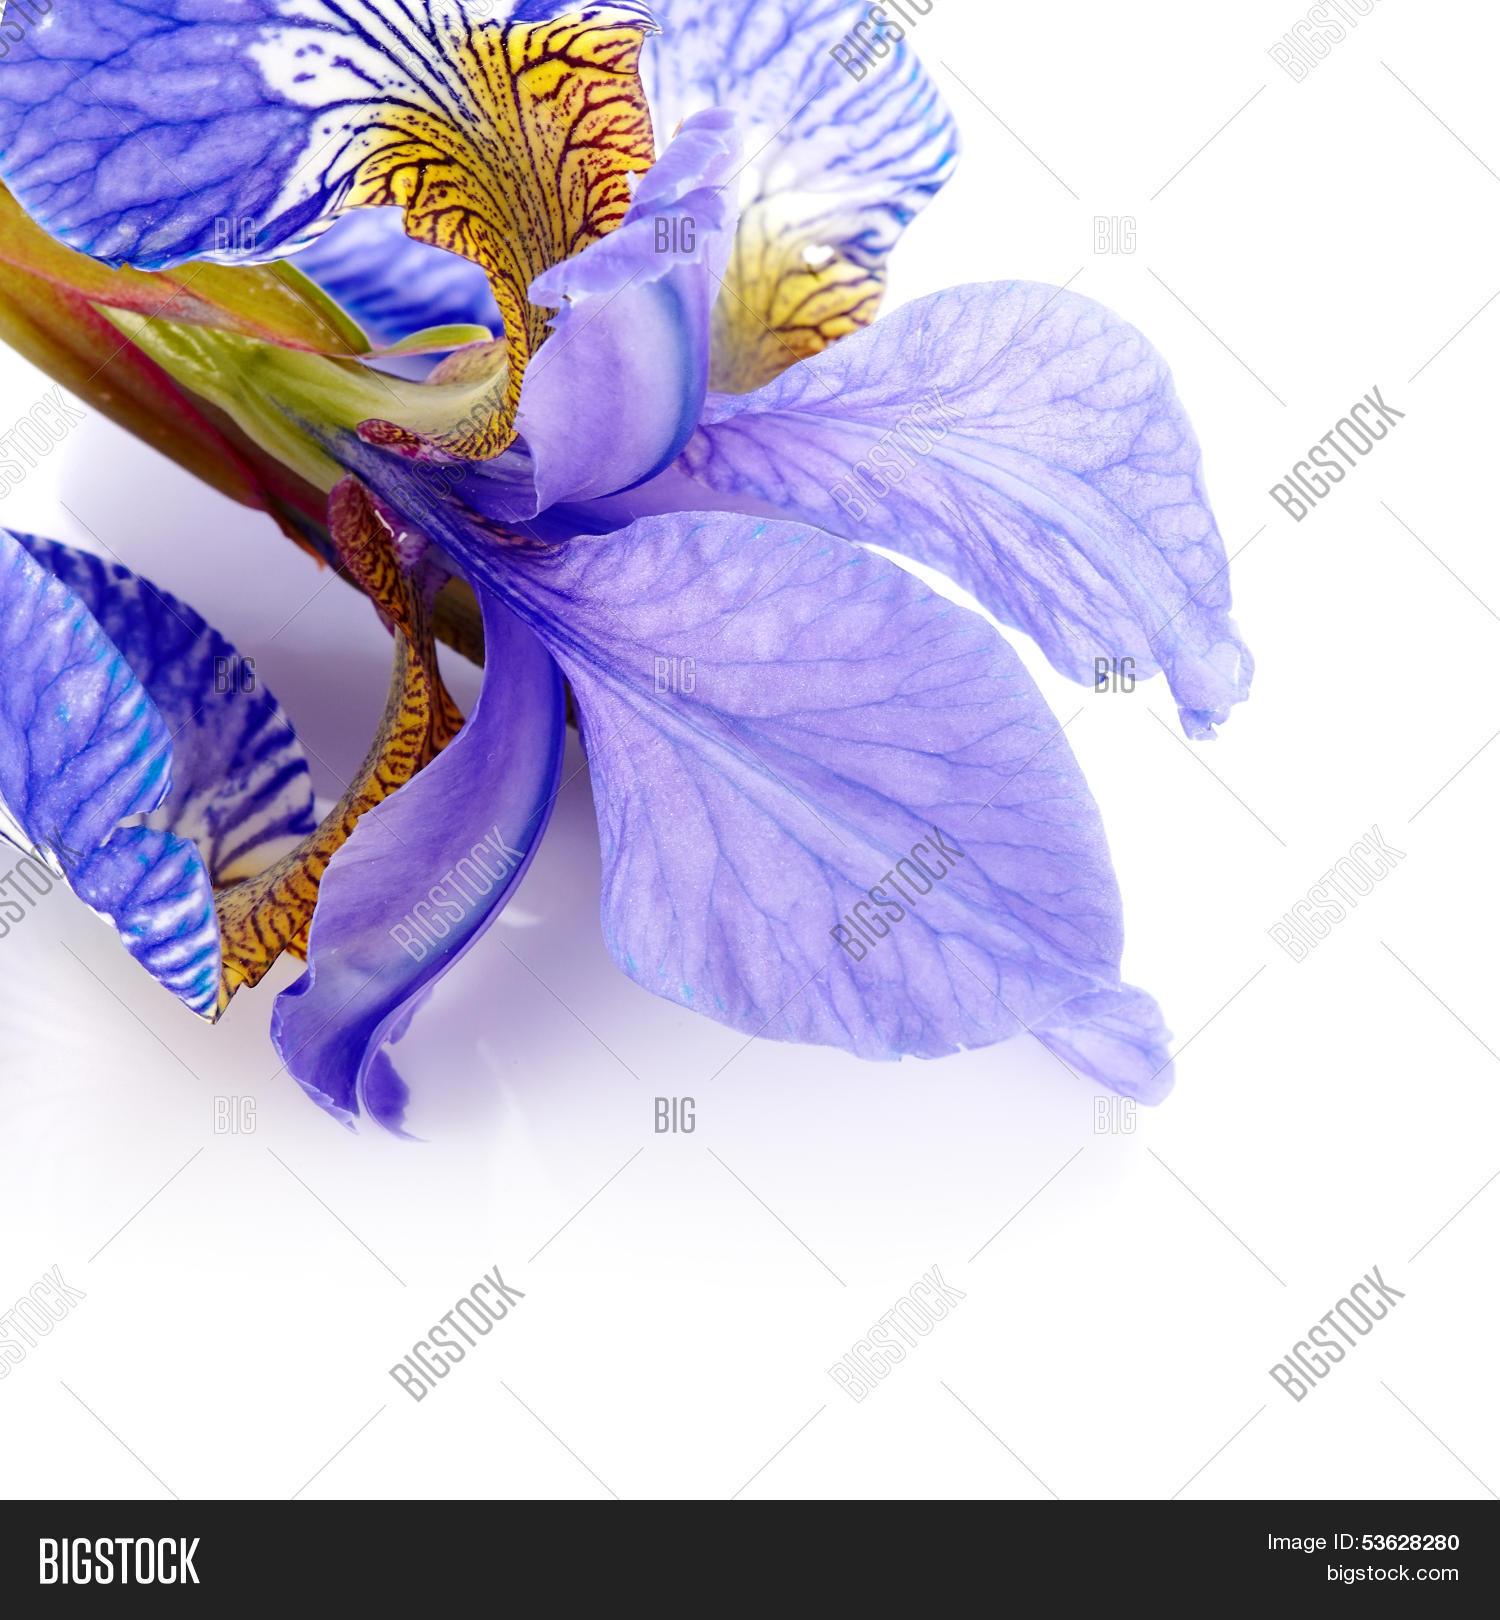 Petals flower iris image photo free trial bigstock petals of a flower of an iris izmirmasajfo